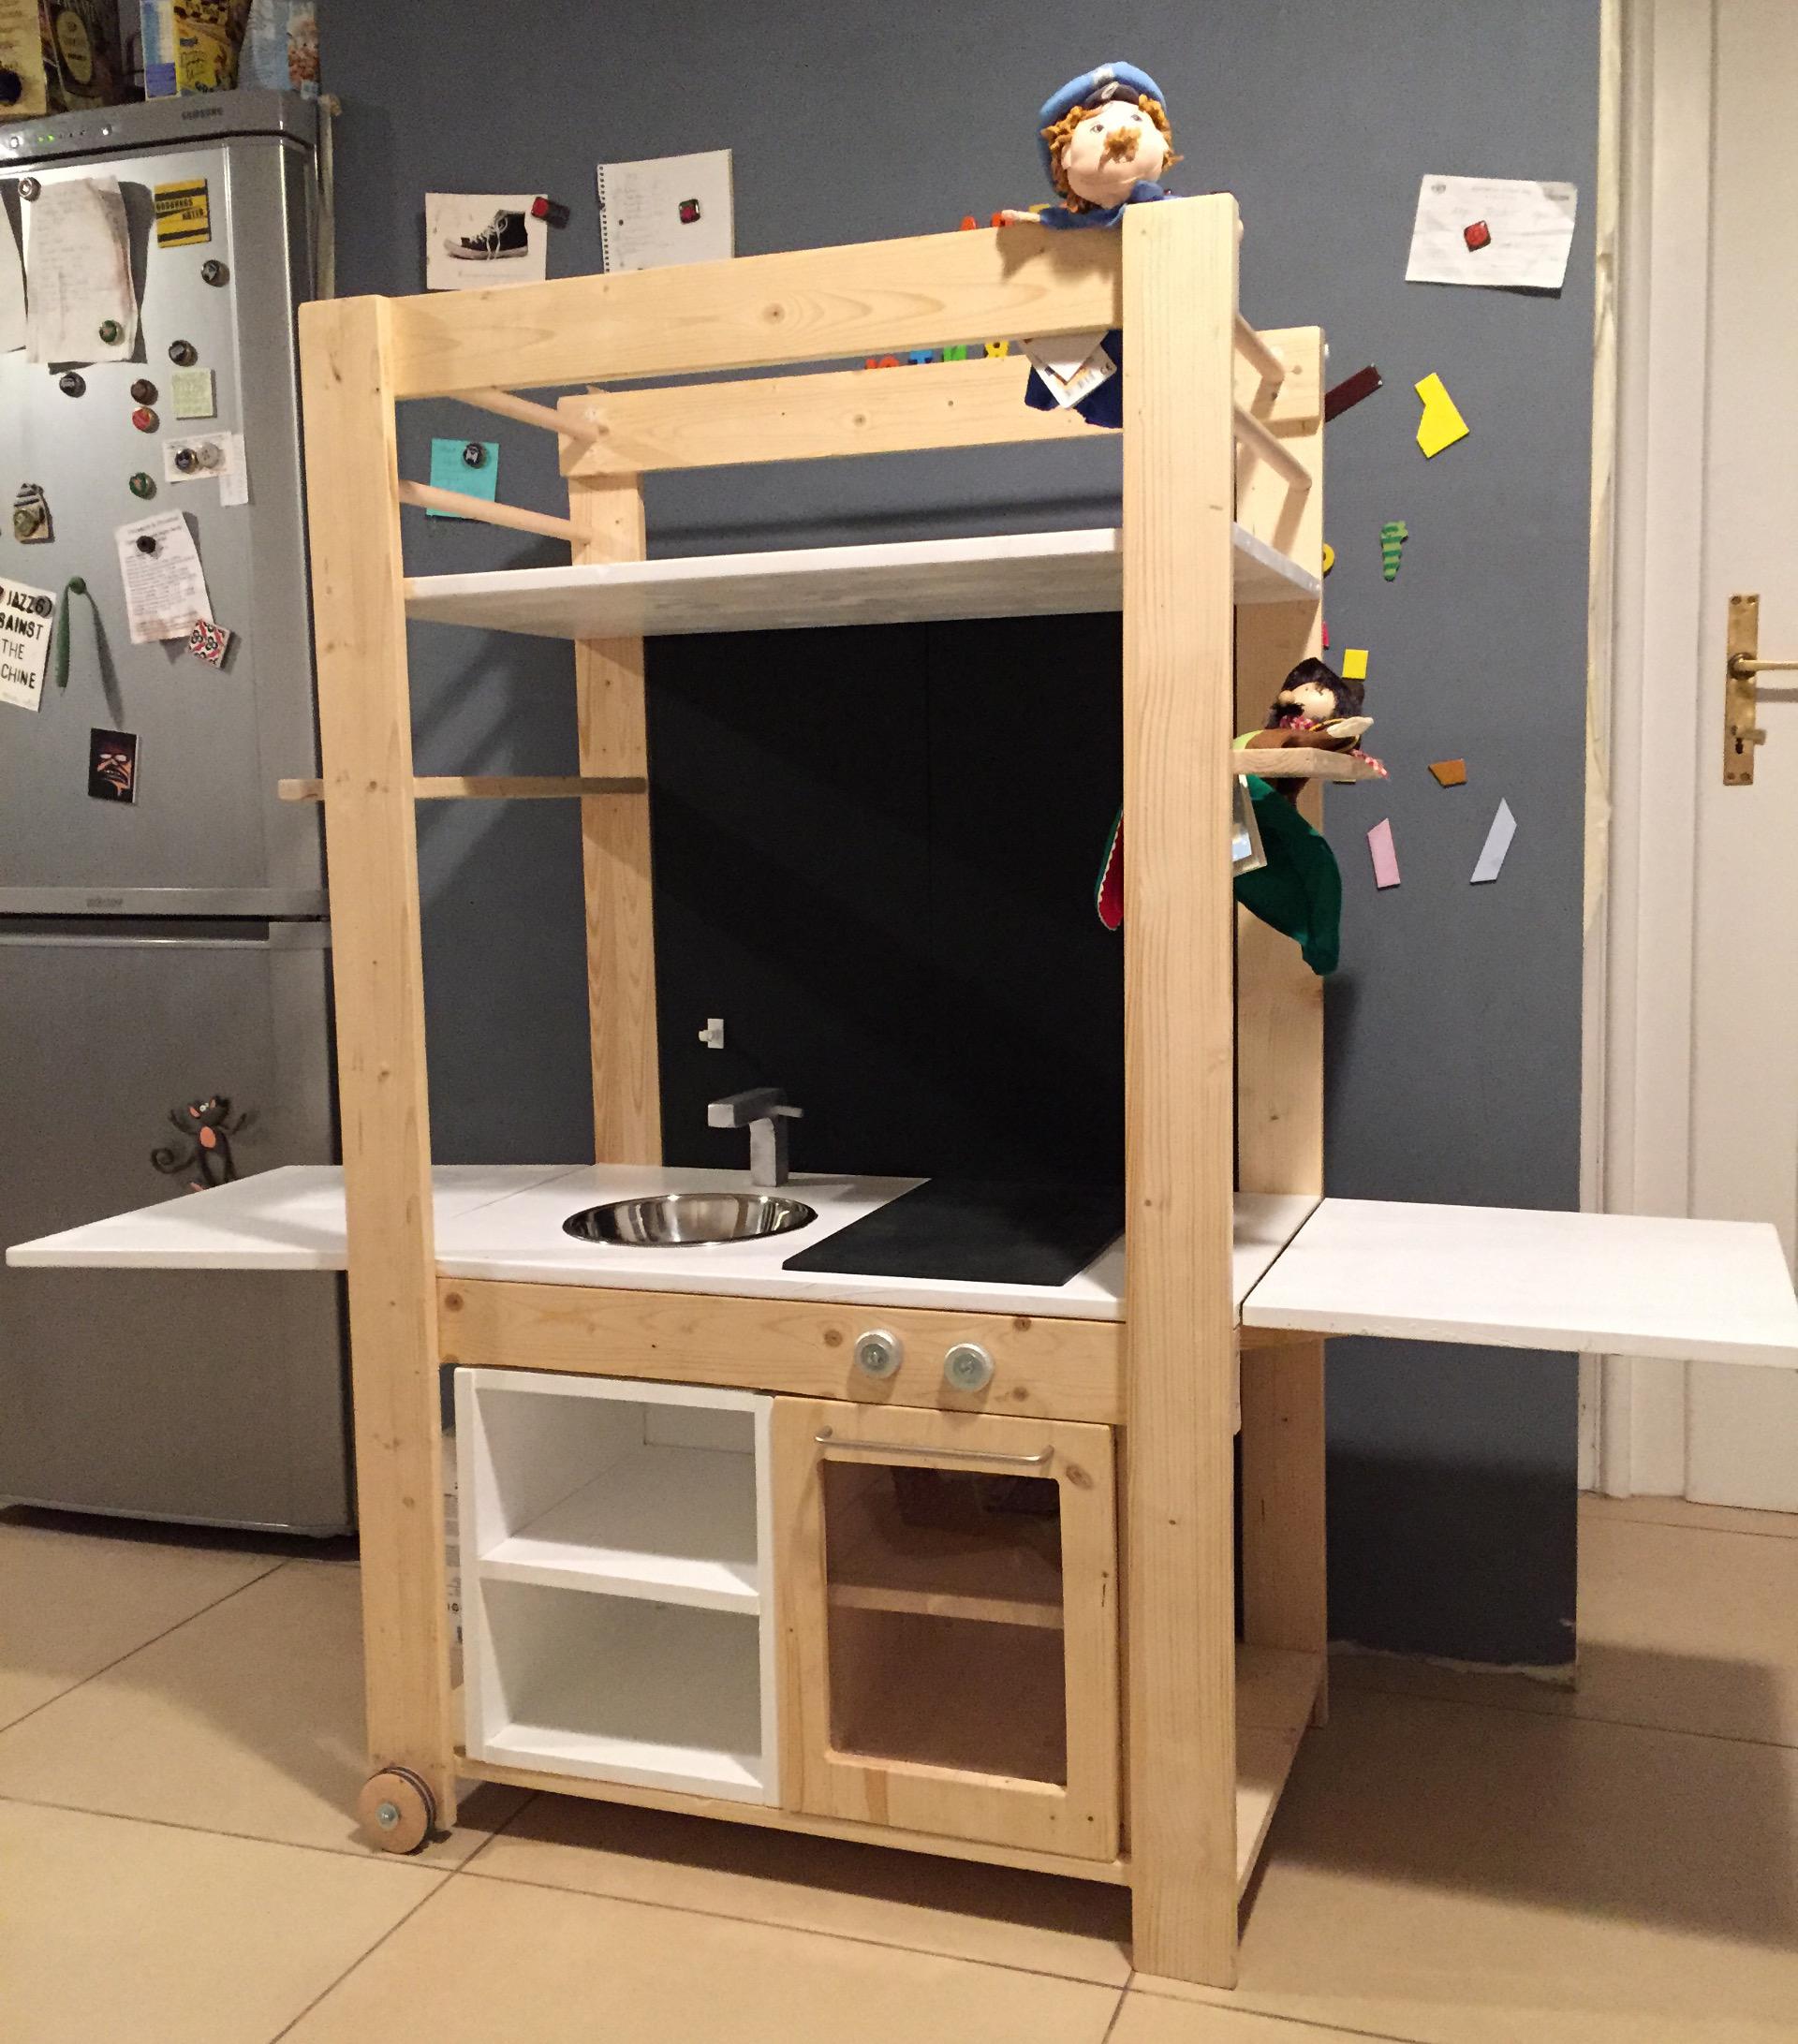 Ikea kinderküche erweitern  Die Kasperleküche - Spielzeug, Holz, Do-It-Yourself - Guido Flohr